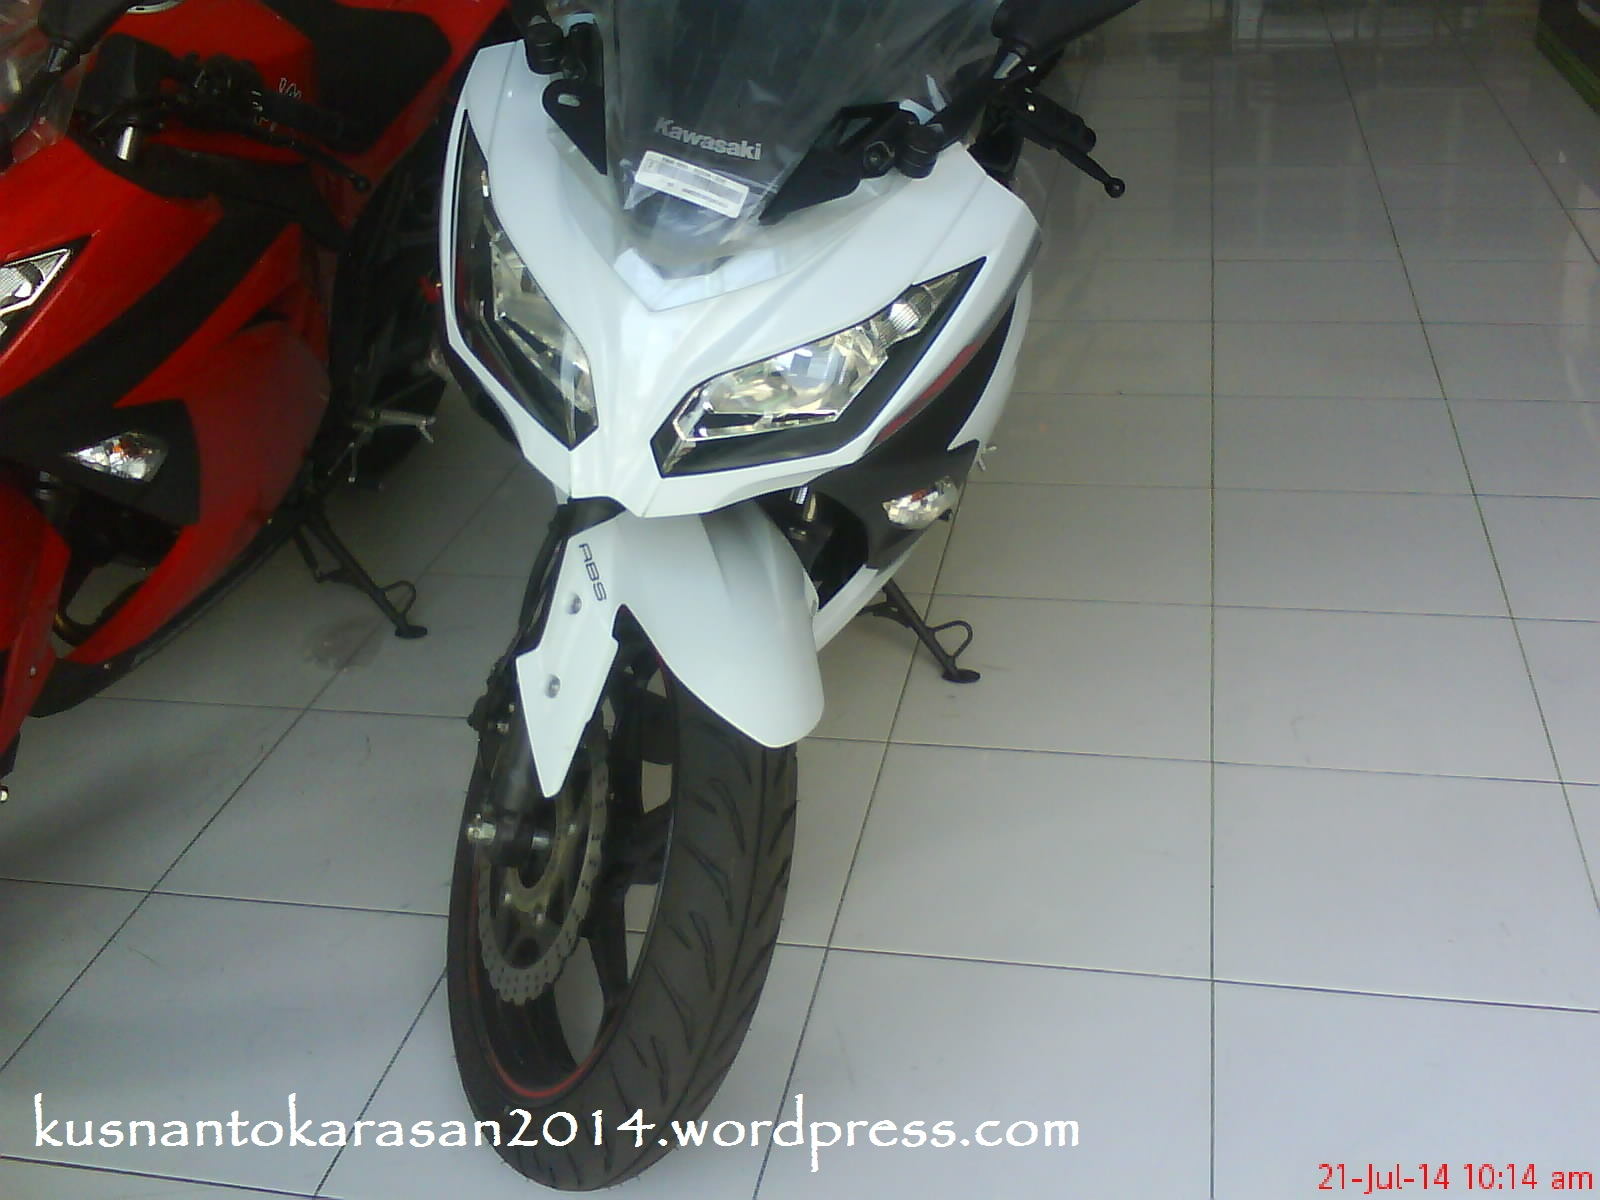 Ninja 250R Motorsport Idola Semua Idola Spesifikasi Dan Harga Di